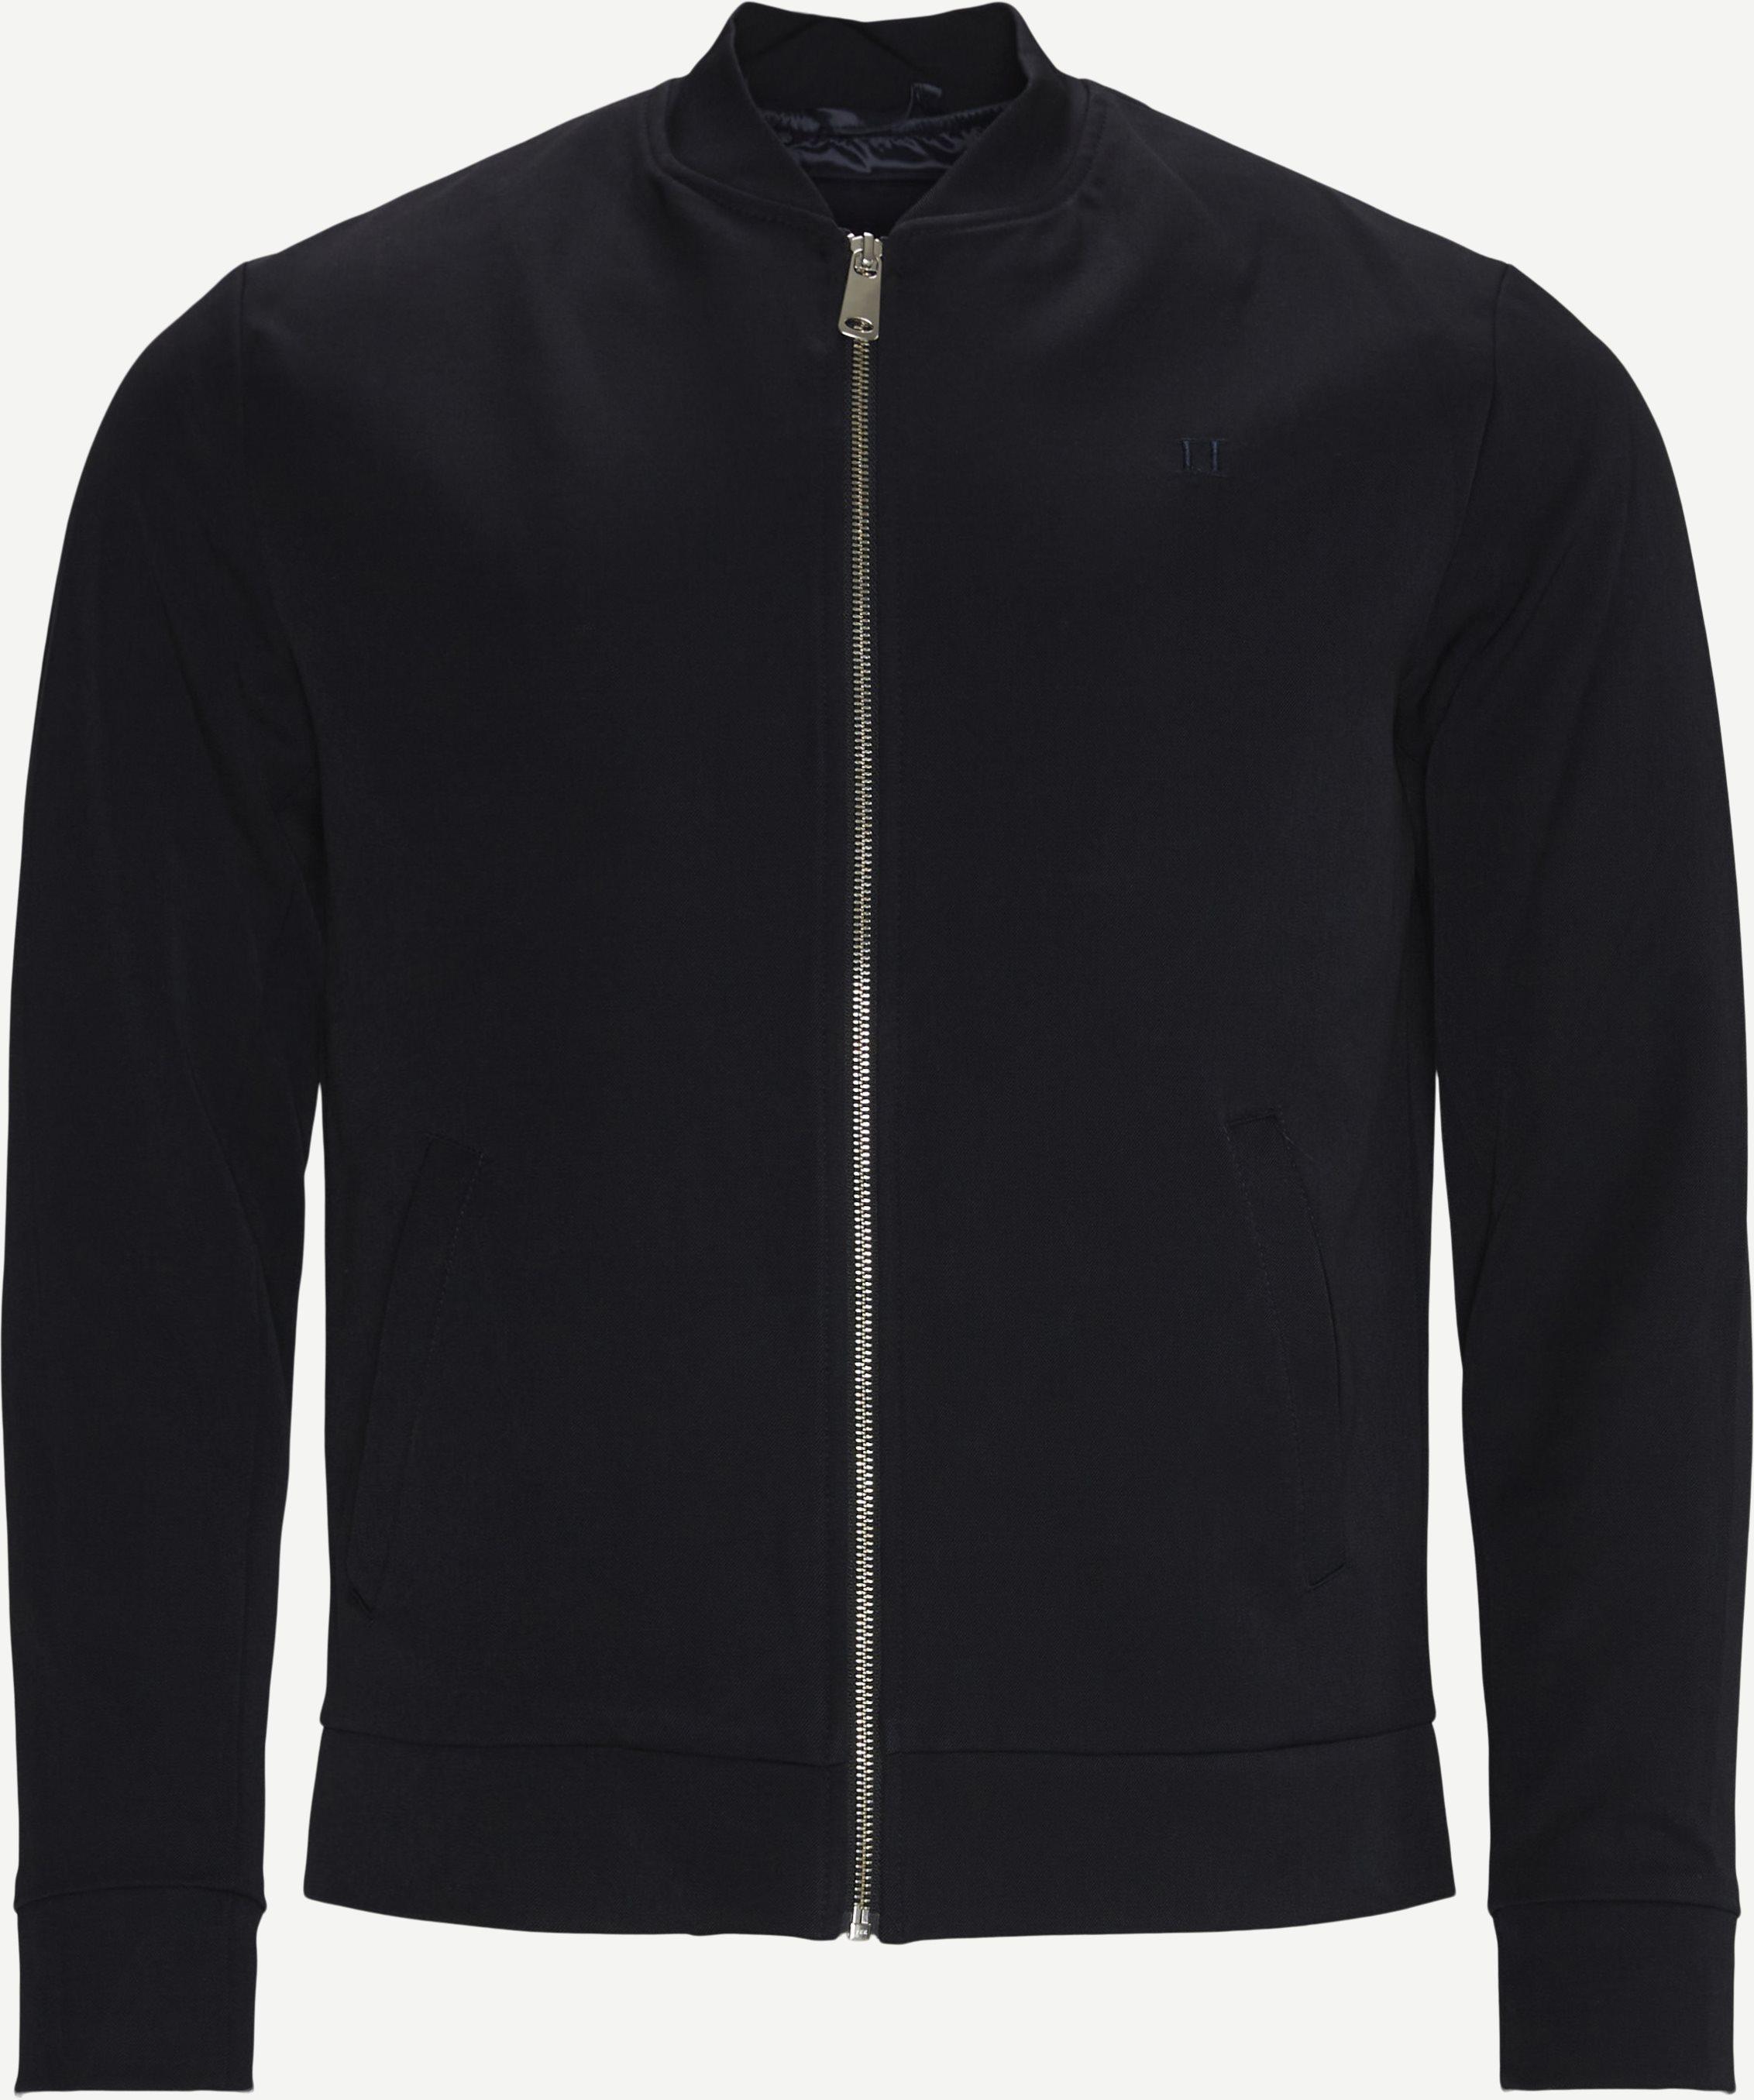 Jacken - Regular fit - Blau